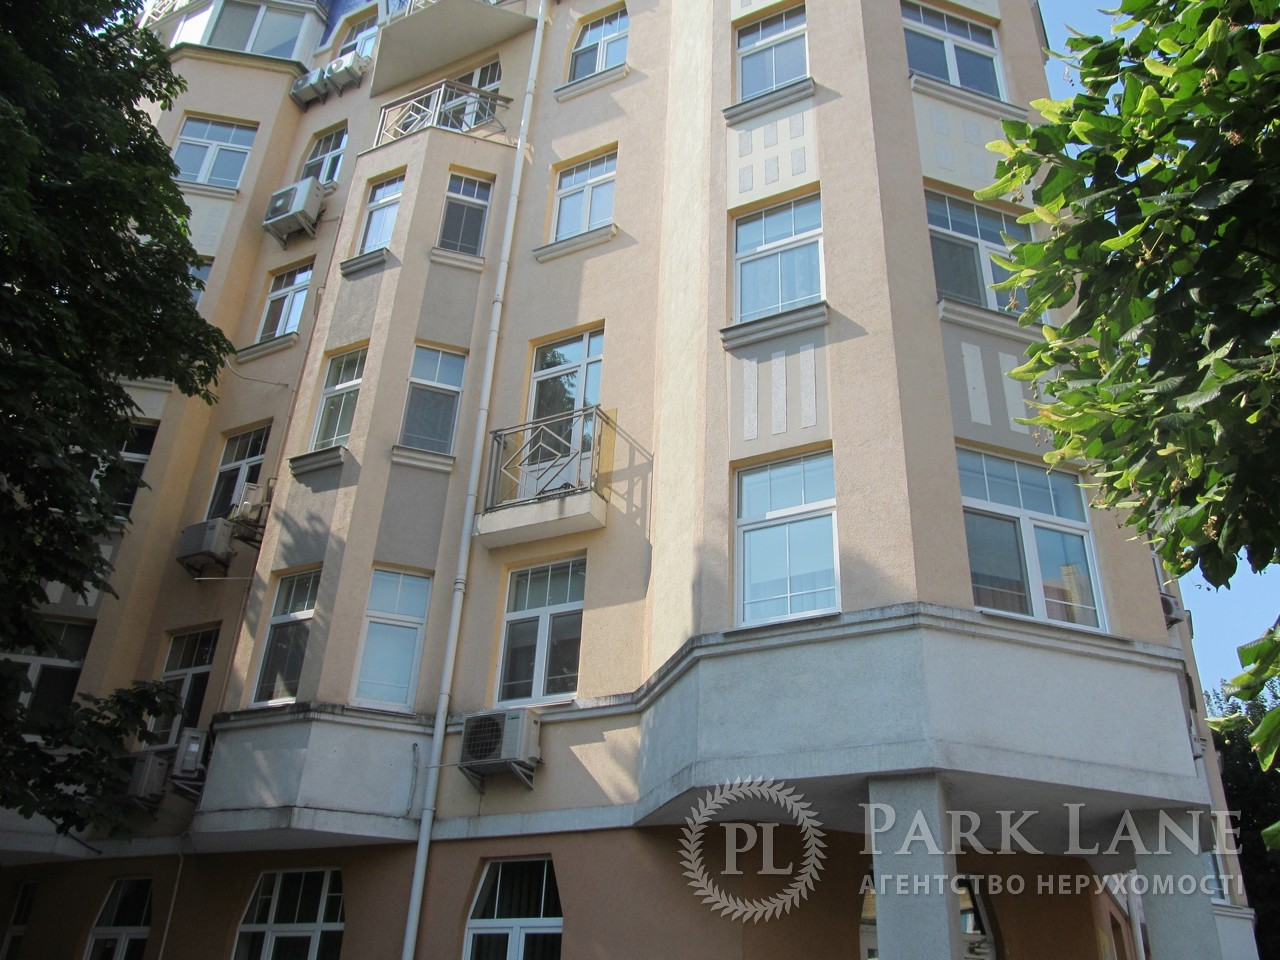 Квартира B-89104, Сковороды Григория, 6, Киев - Фото 4